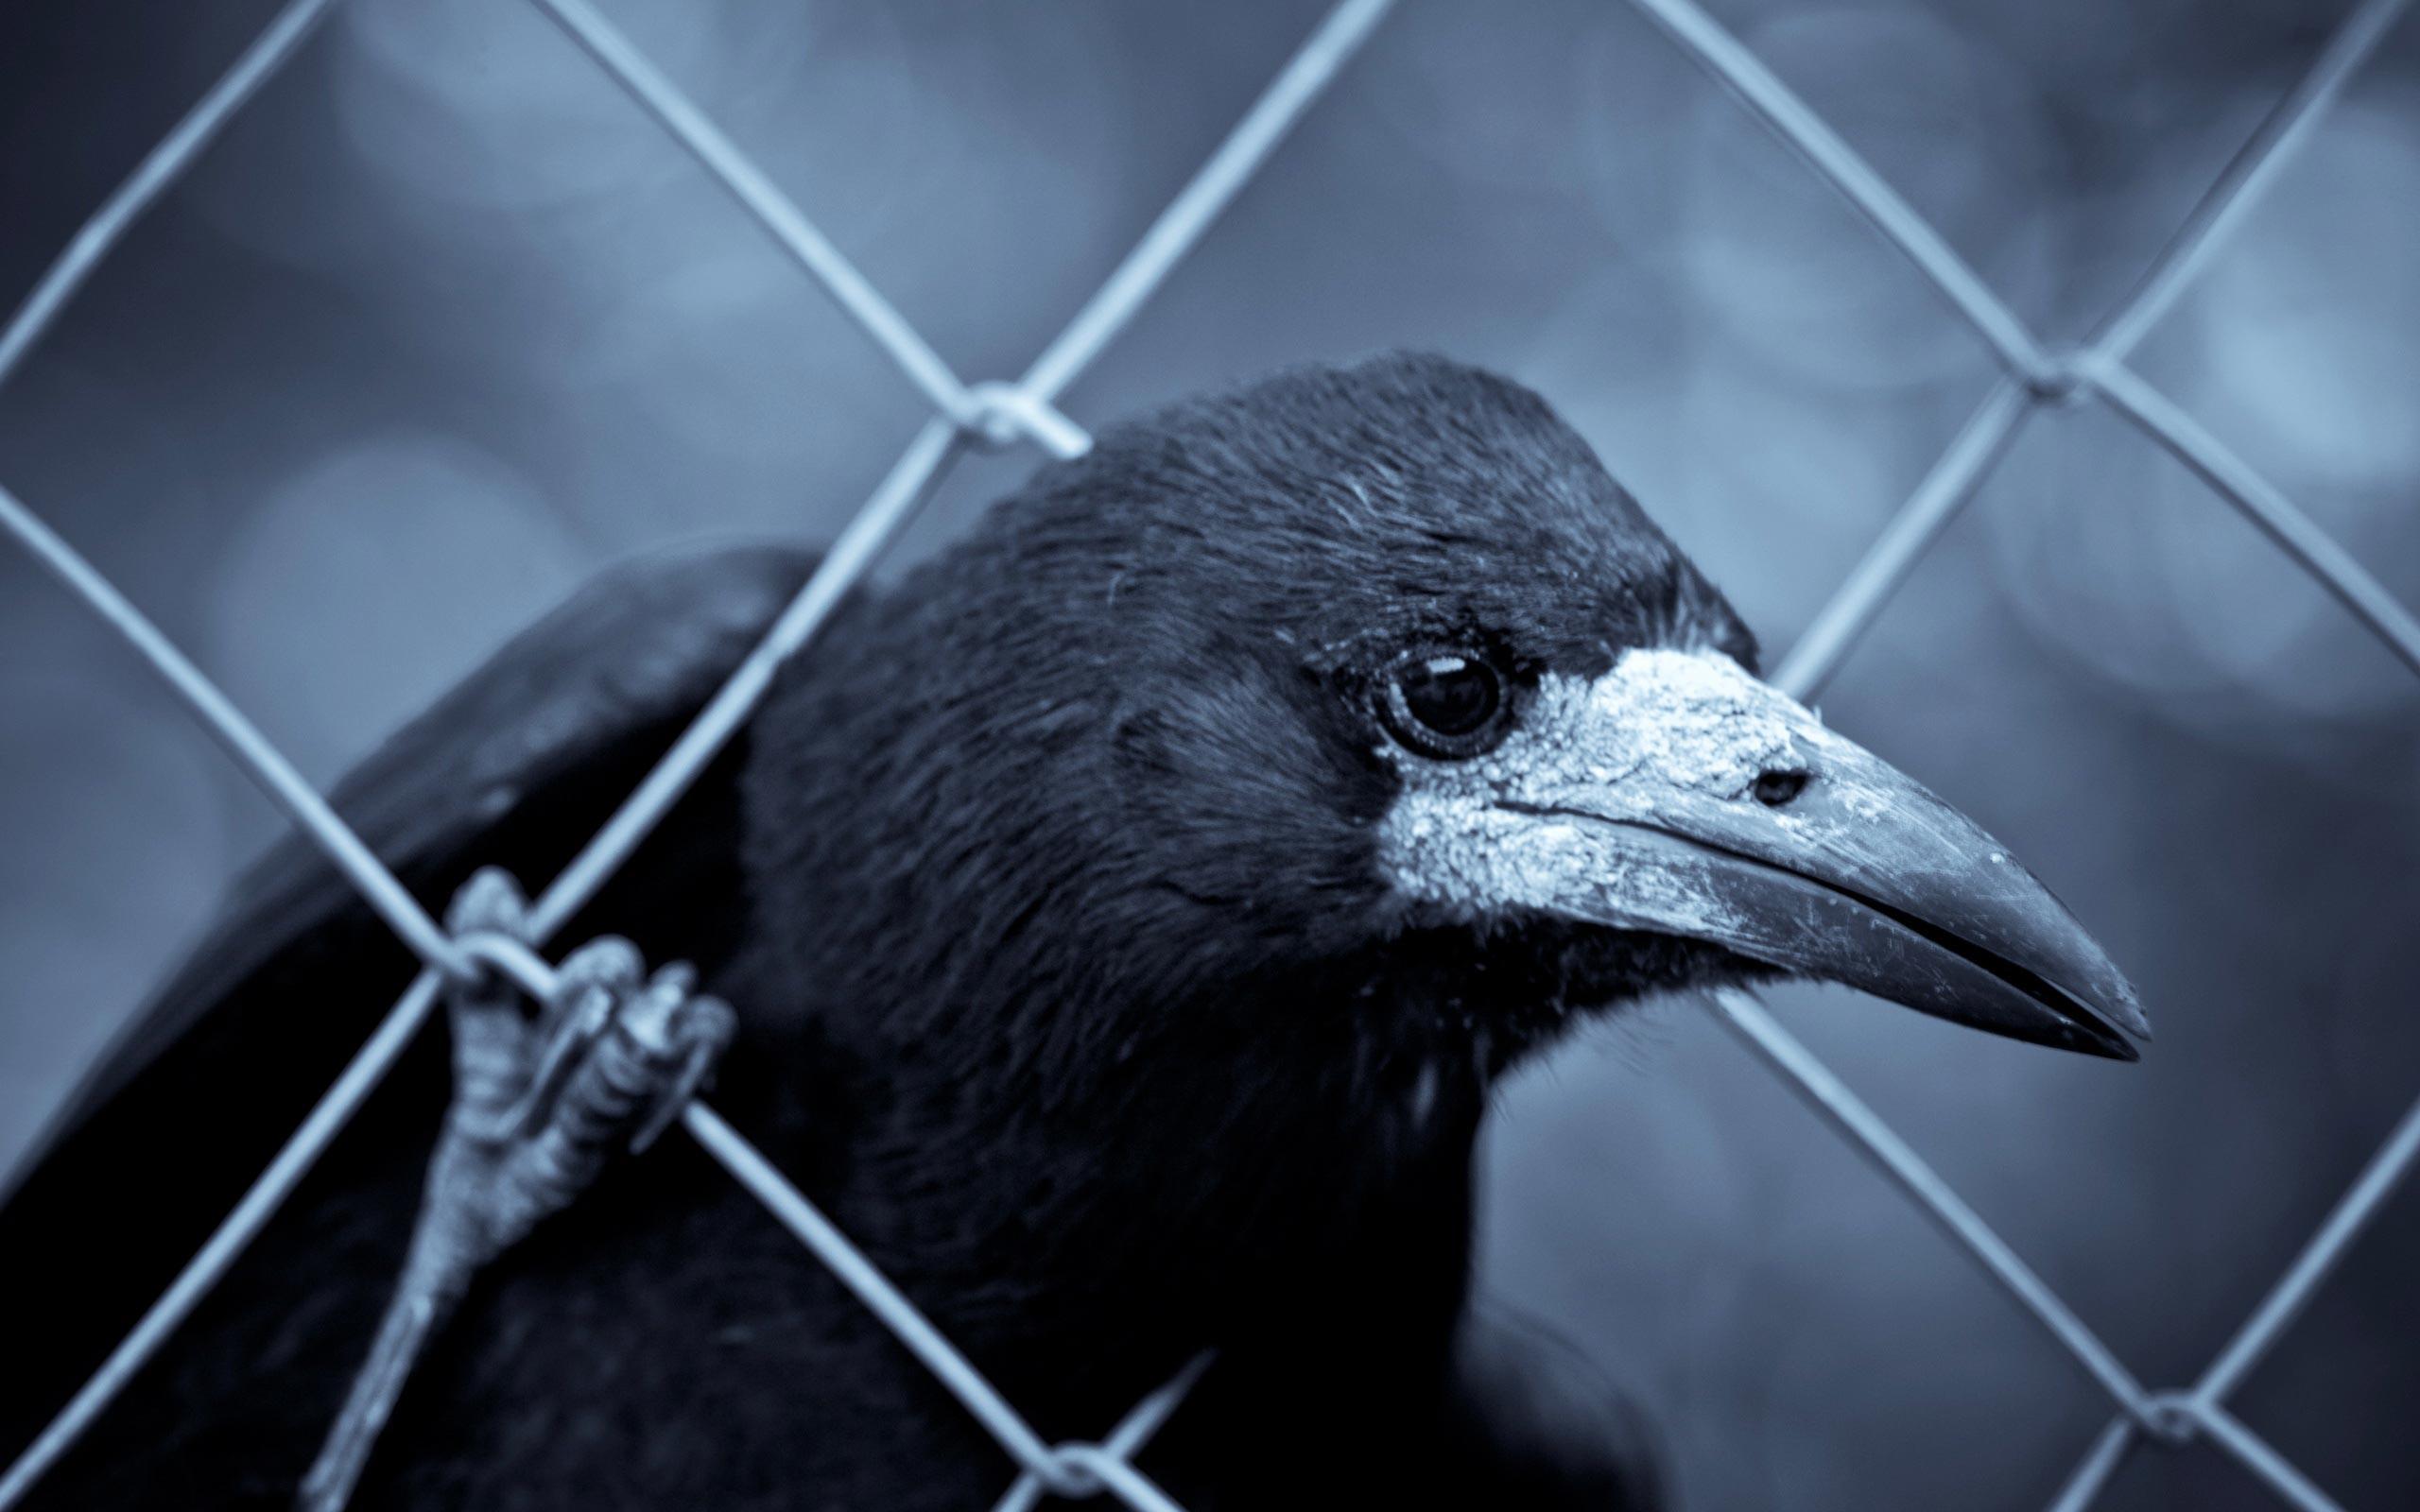 Black Raven Wallpaper HD Wallpaper WallpaperLepi 2560x1600